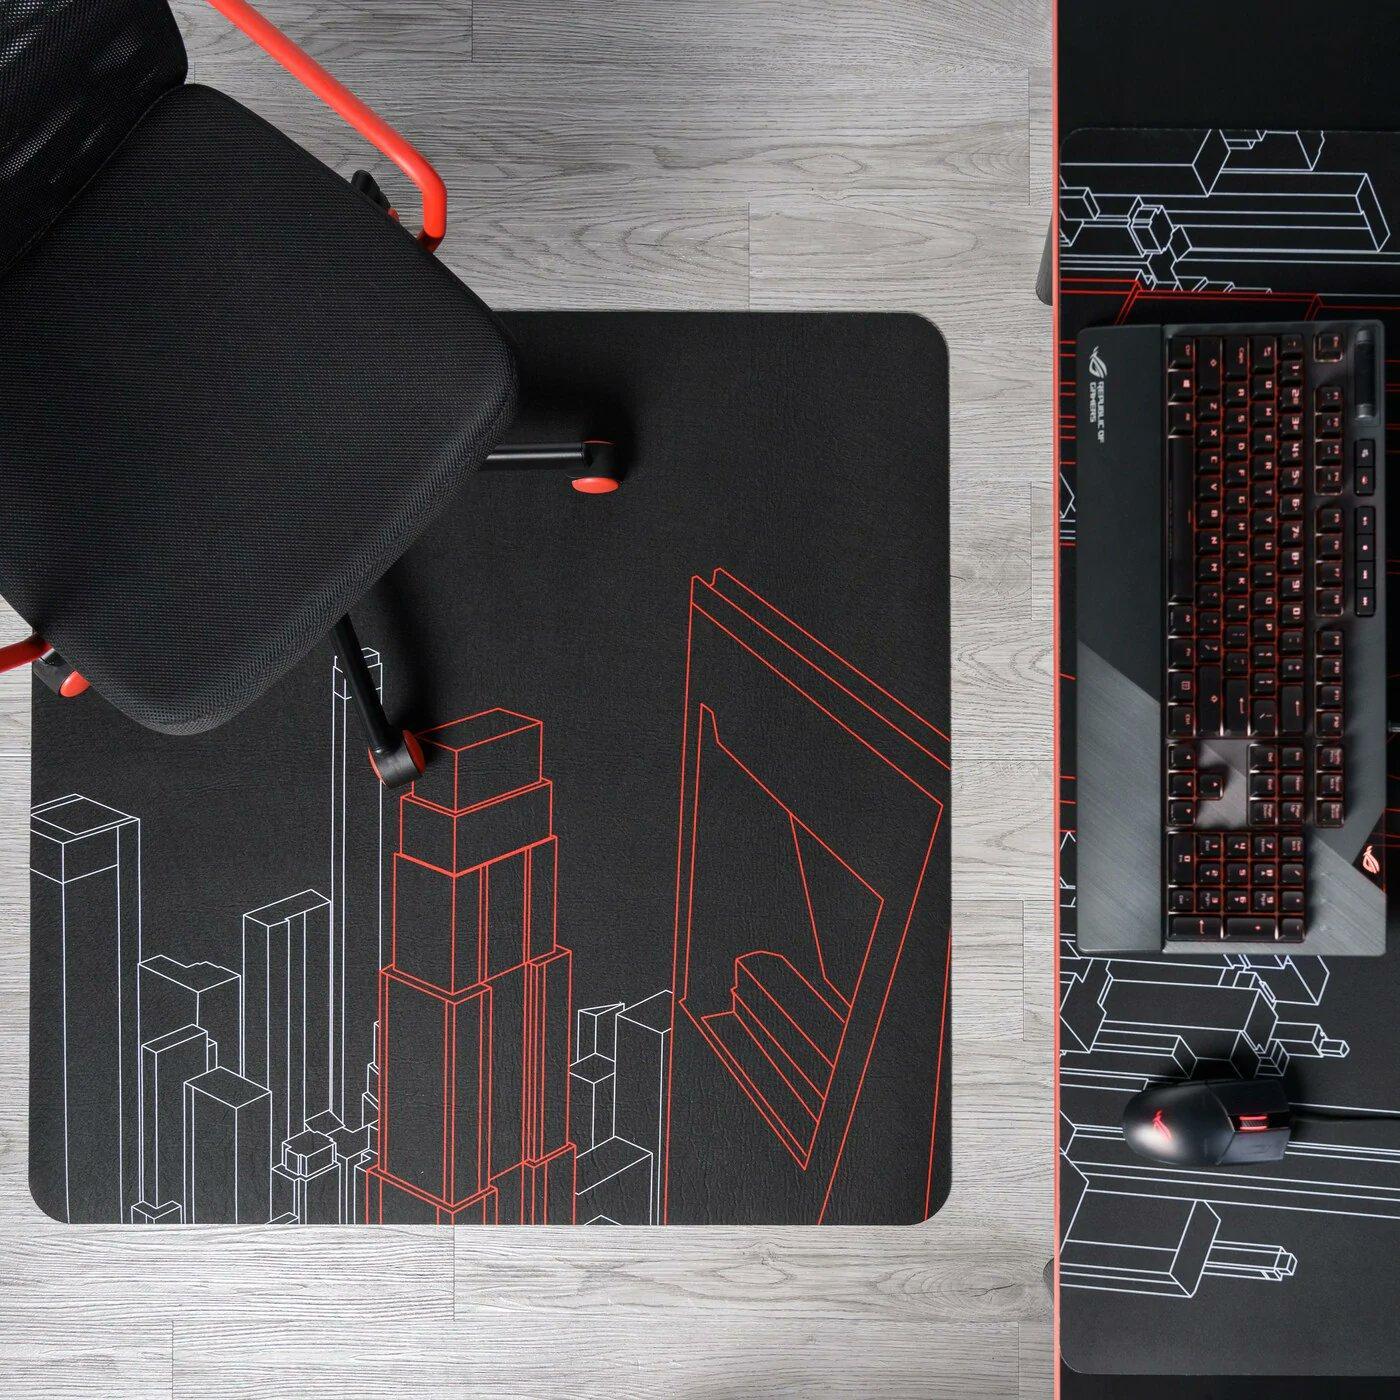 Asus Ikea Tapis Souris Mousepad Rog Meuble Gaming Gamer Jeu